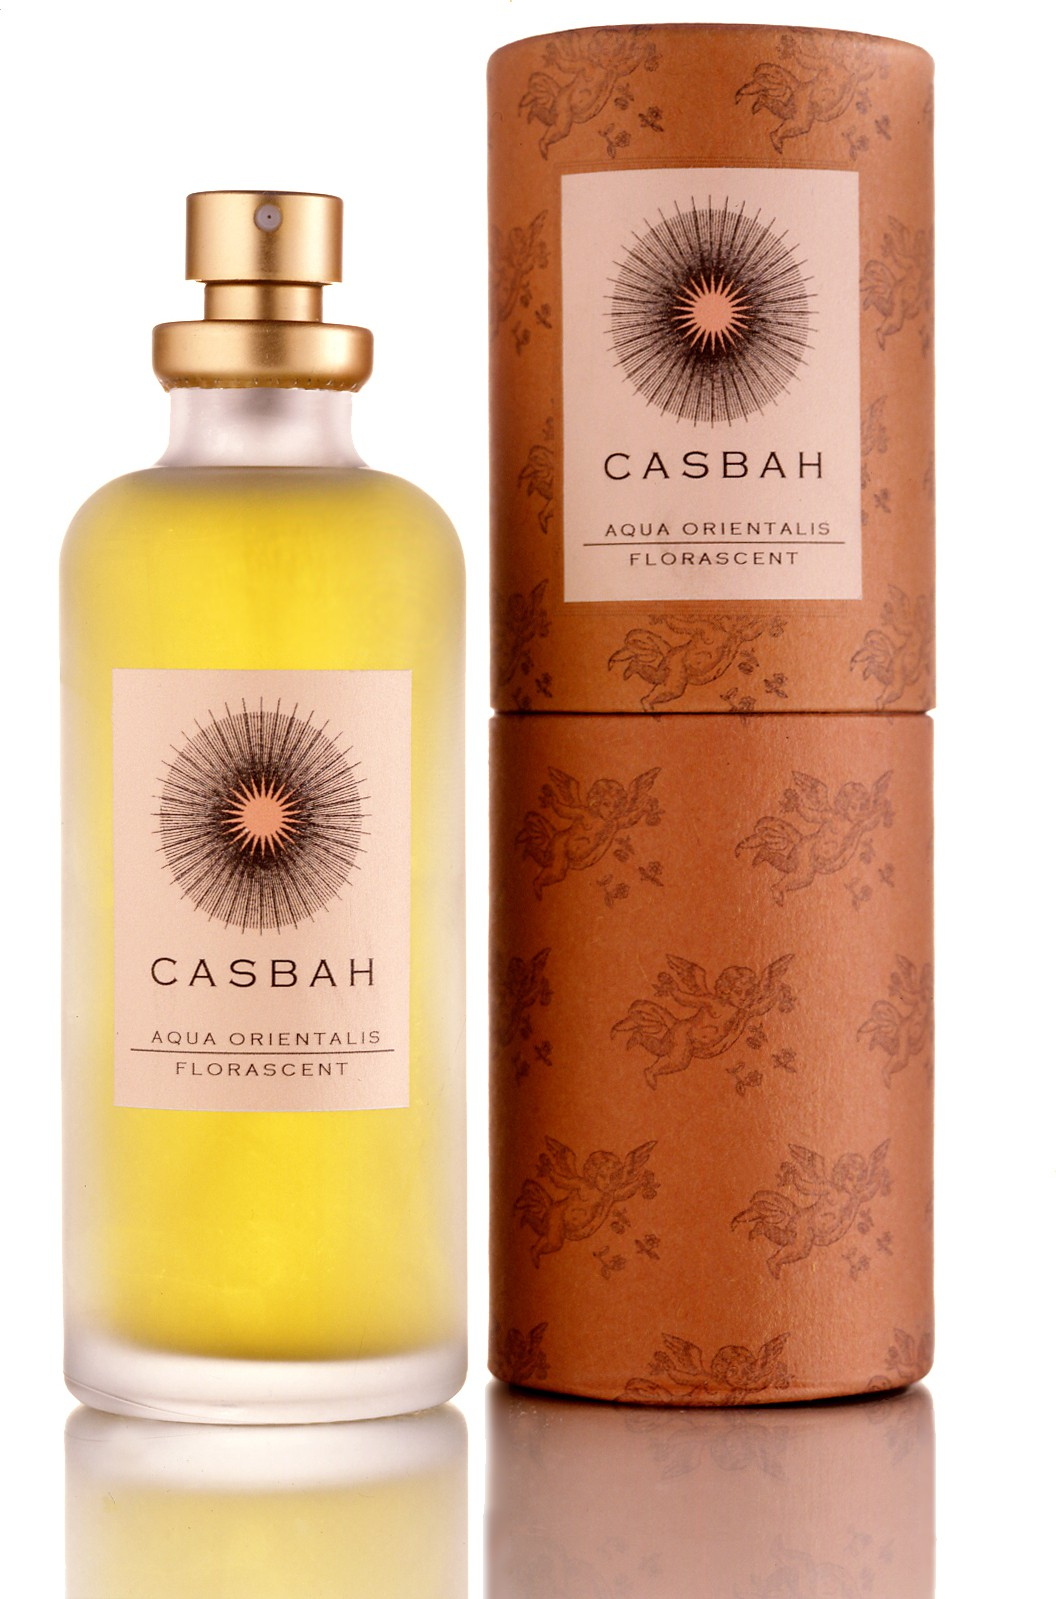 Florascent Aqua Orientalis Casbah аромат для женщин